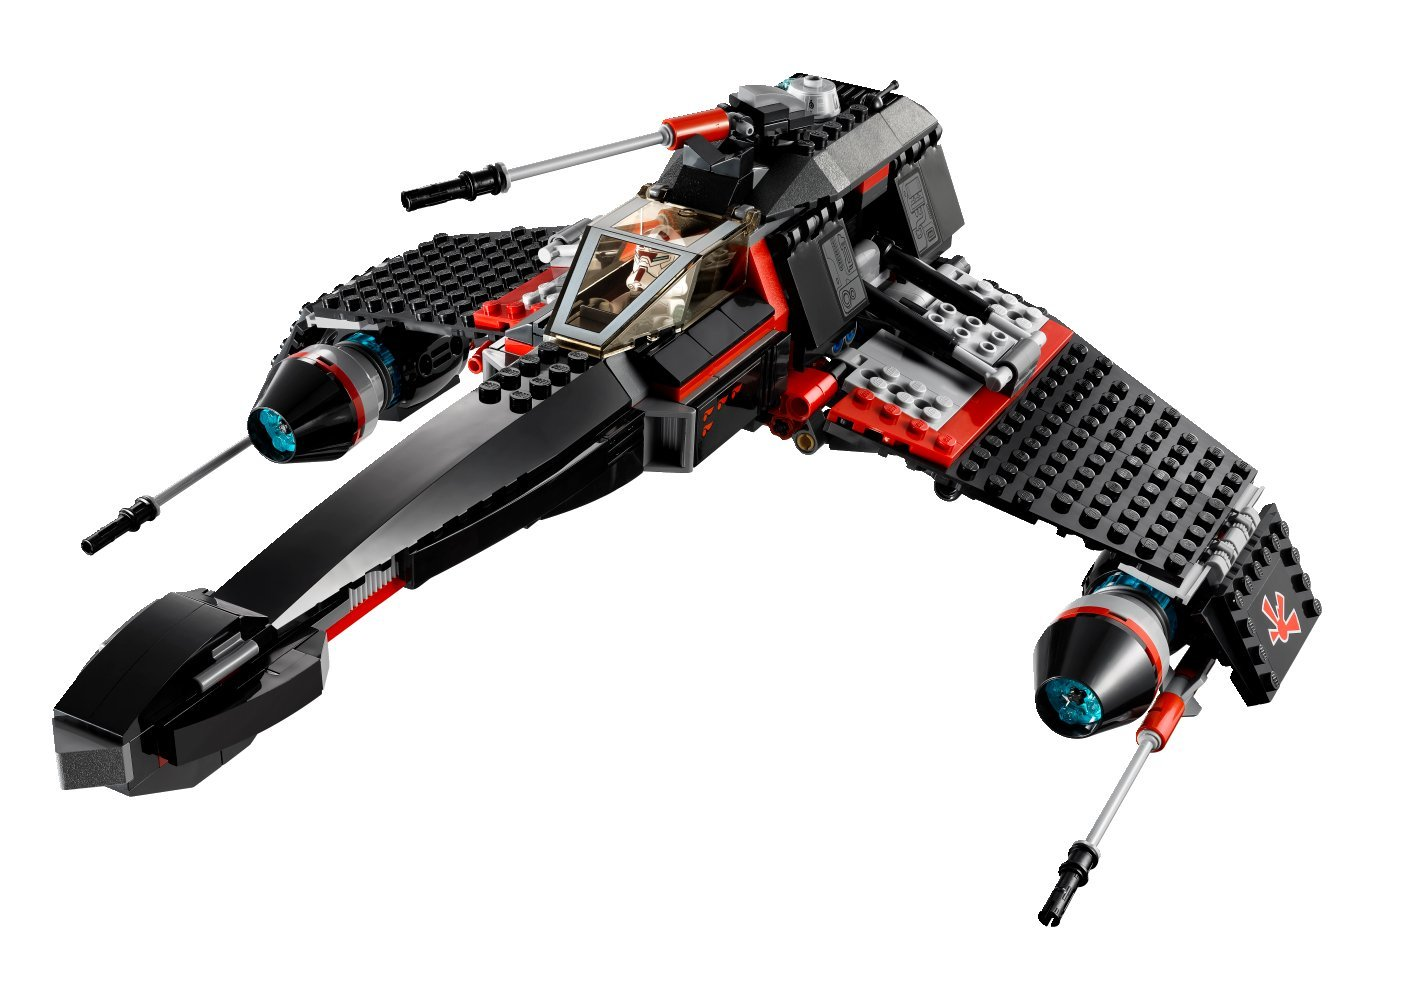 Star Wars Lego 75018 JEK-14's Stealth Starfighter | Star War… | Flickr